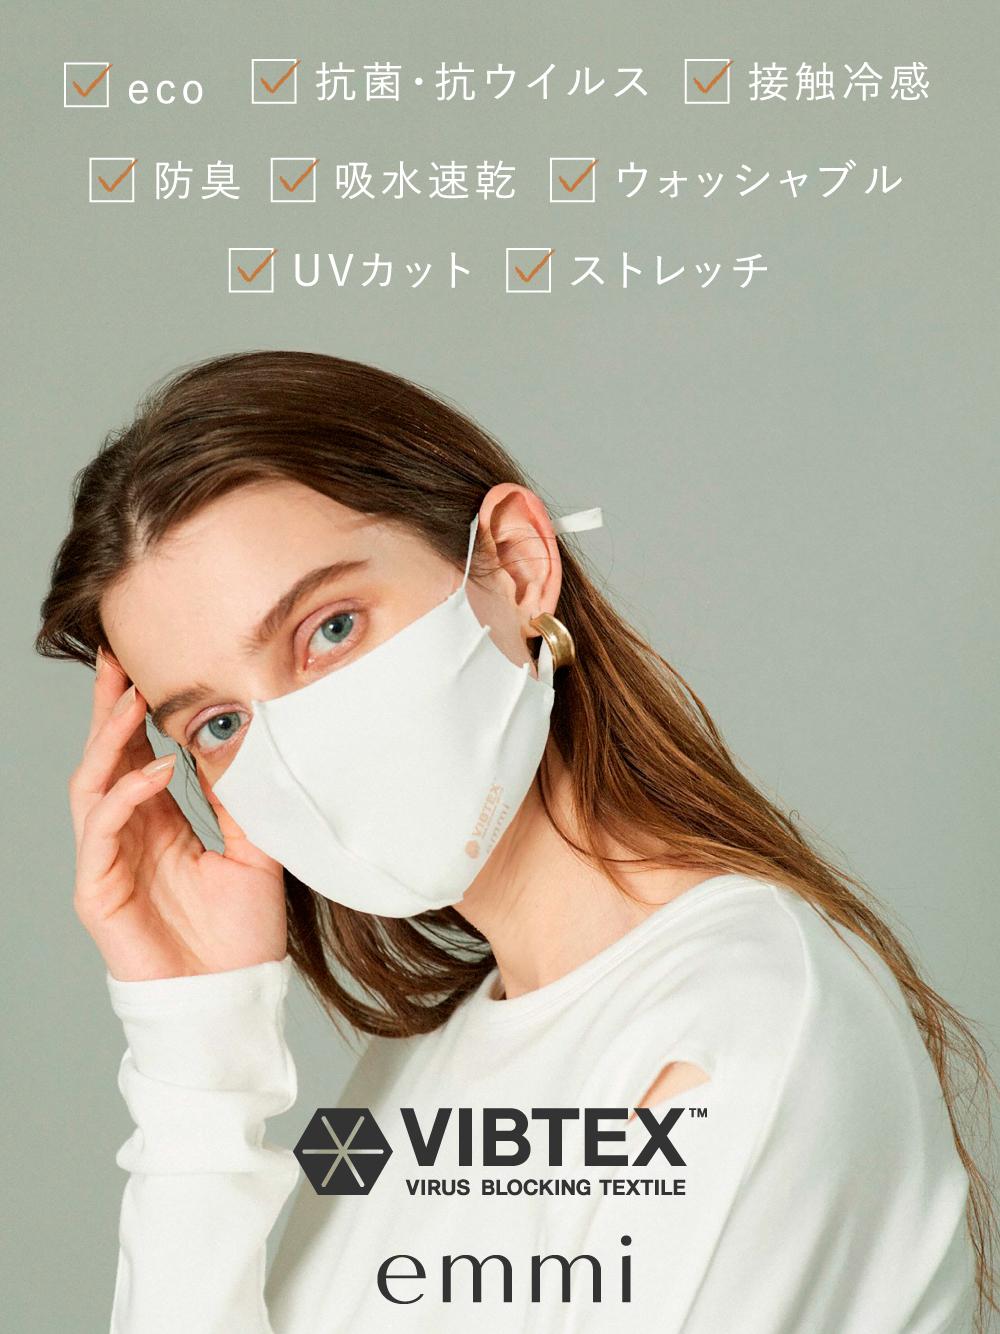 【emmi yoga】VIBTEX マスクアジャスター付き(WHT-F)